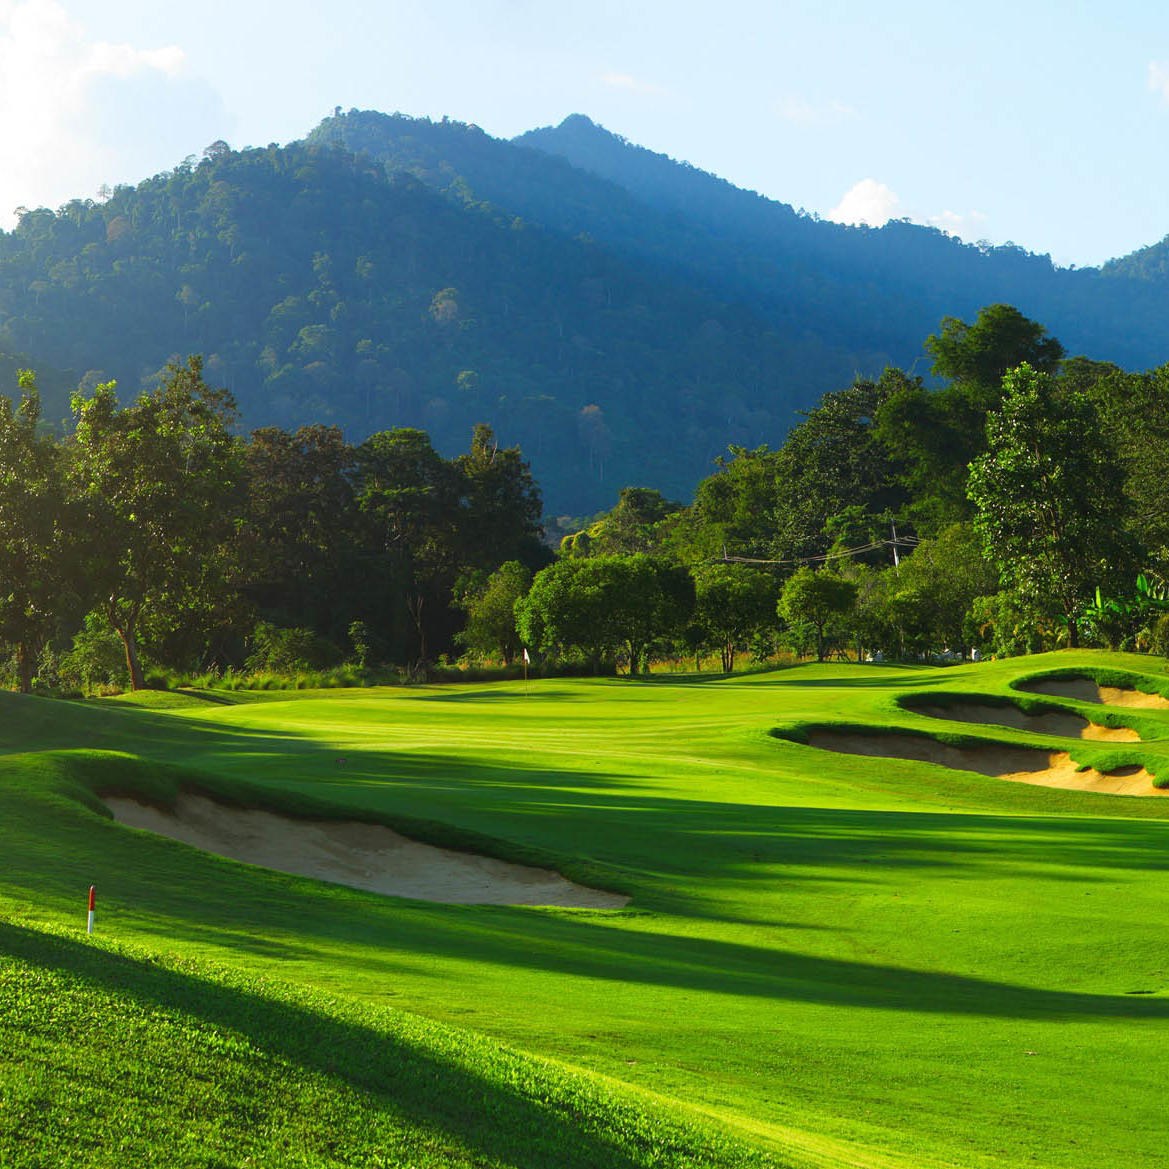 Landscape View of at Chatrium Golf Resort Soi Dao Chanthaburi